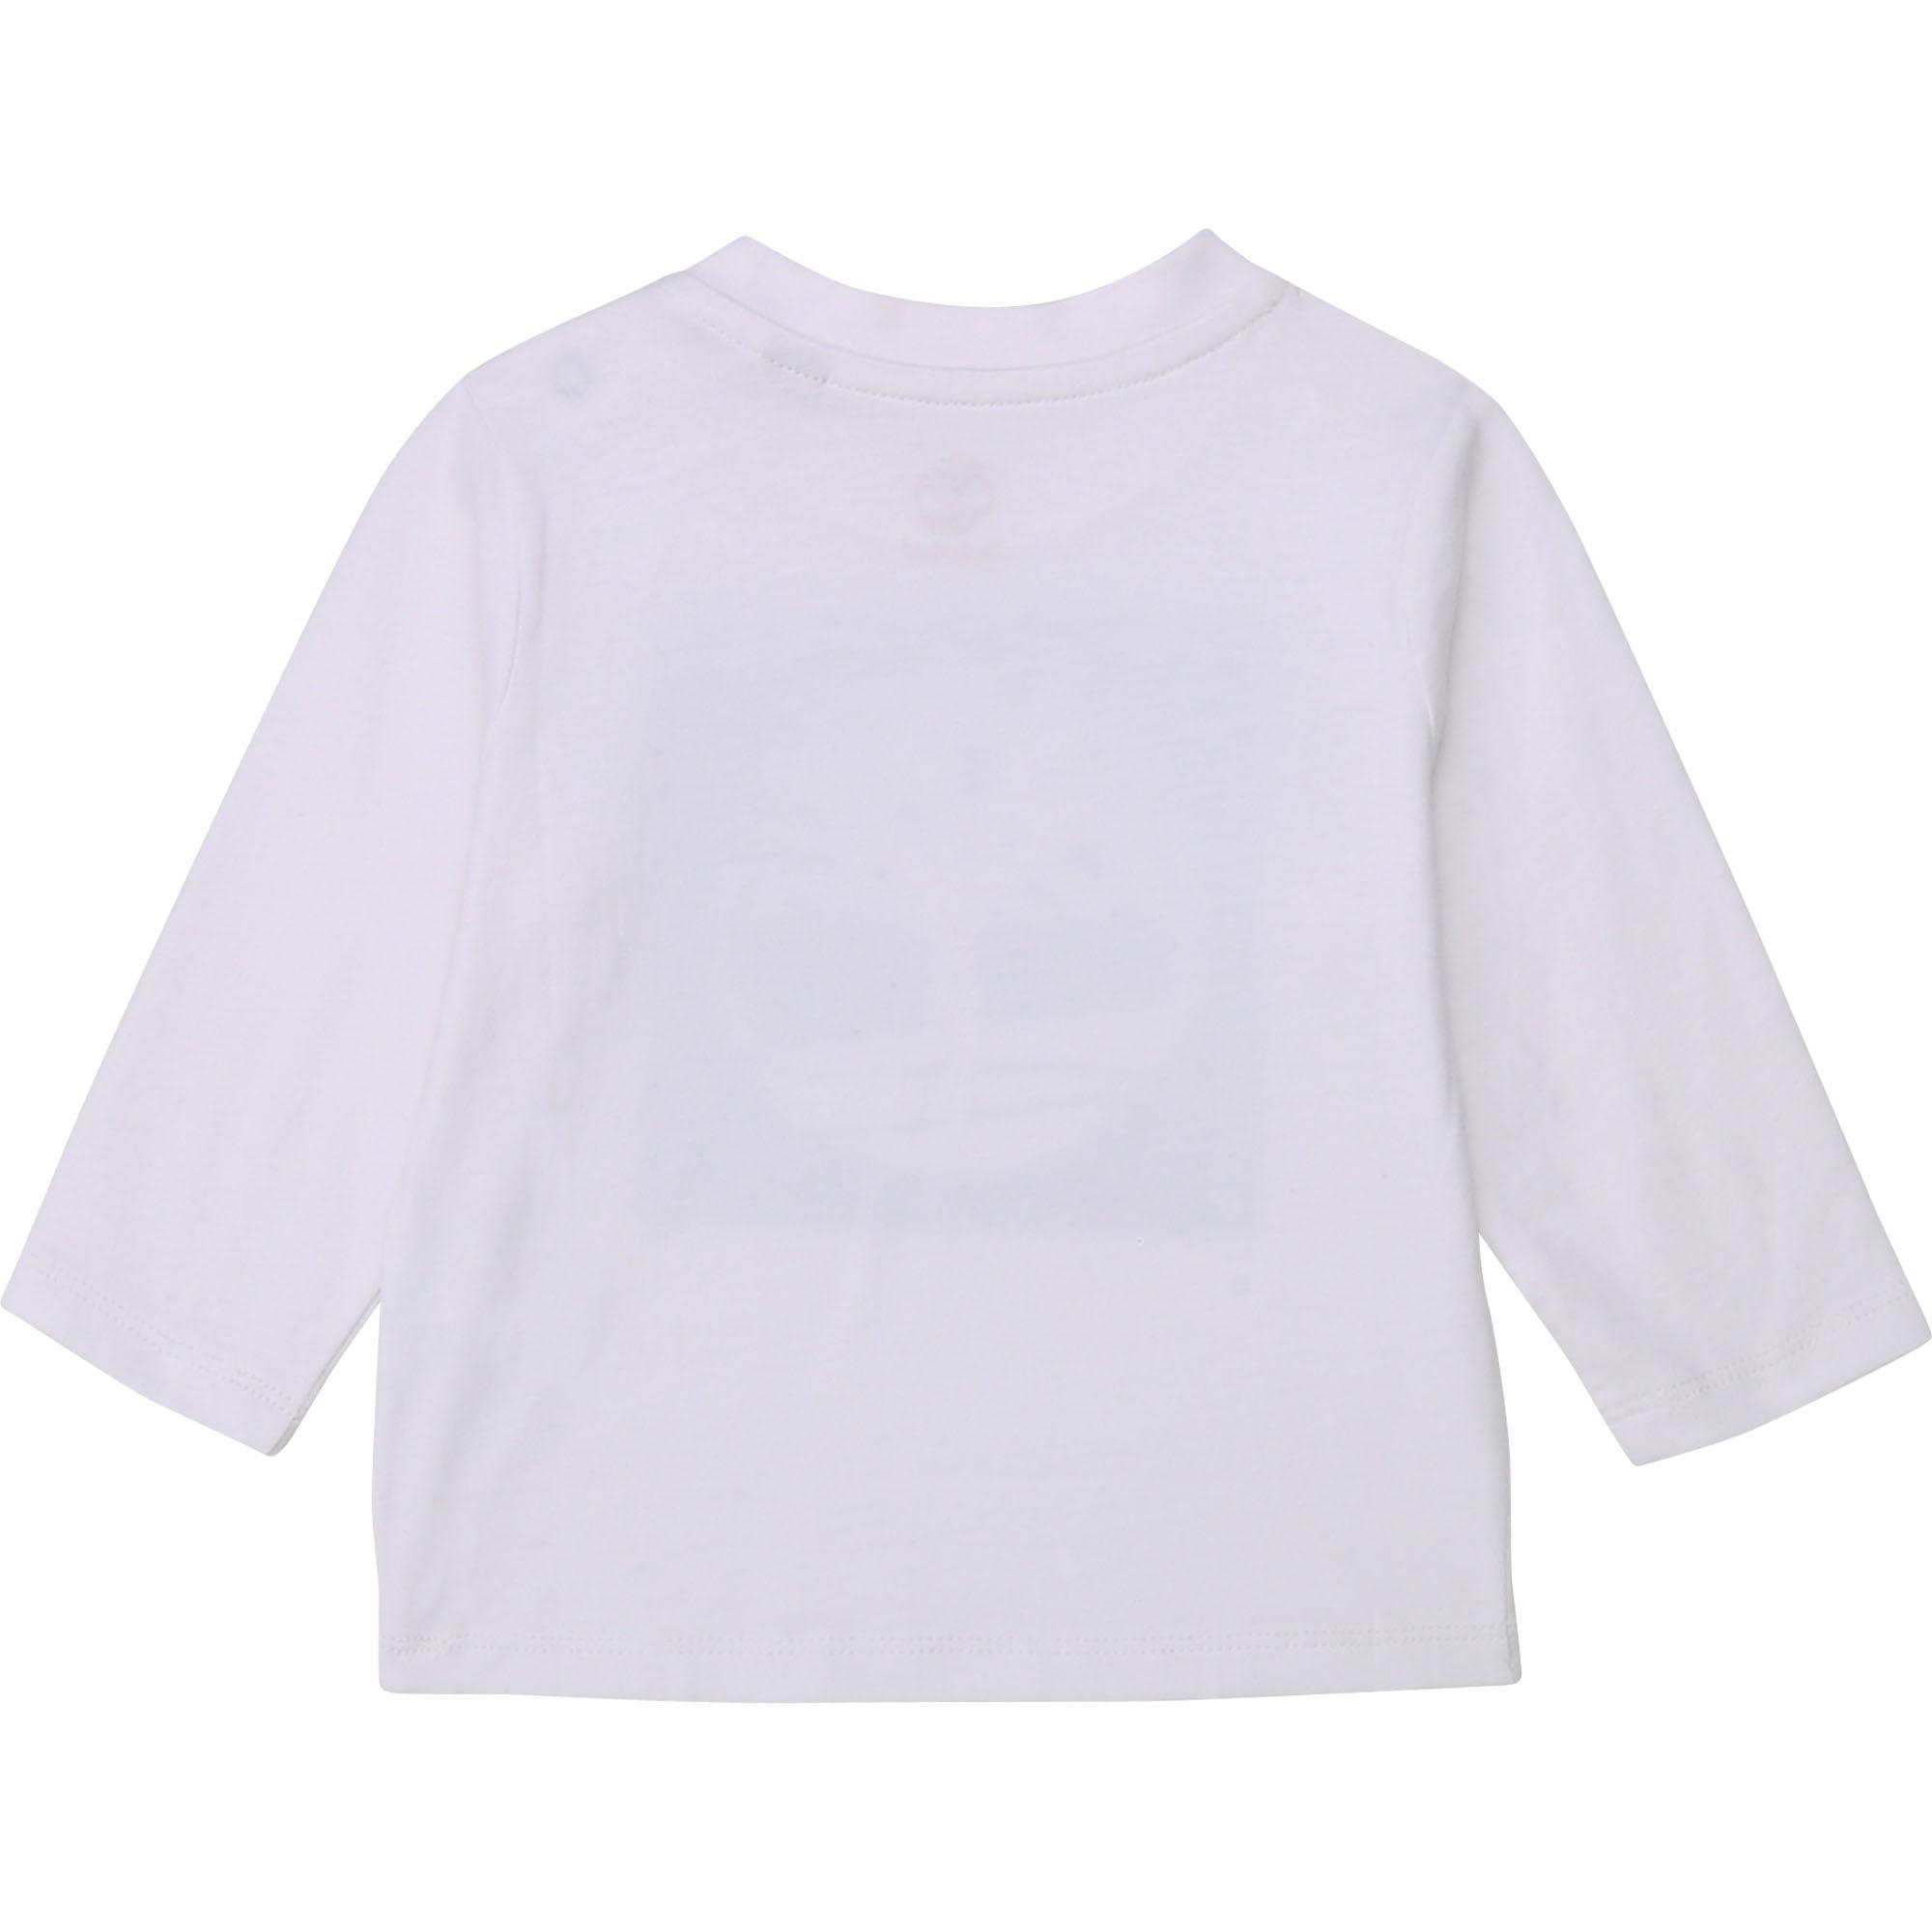 TIMBERLAND t-shirt jersey manches longues-2